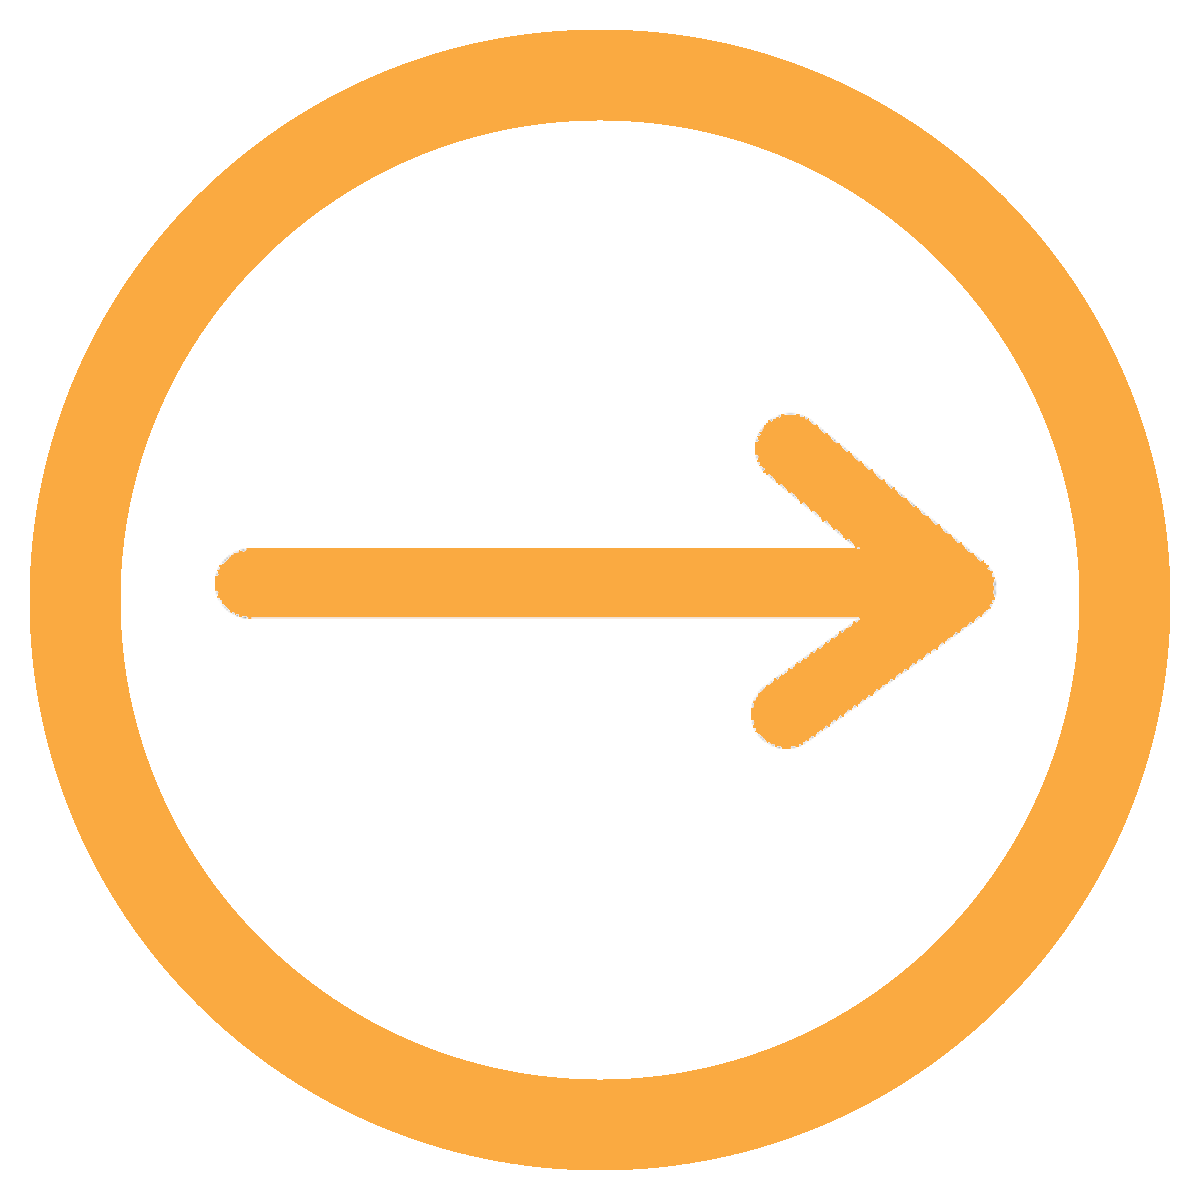 fleche cercle orange